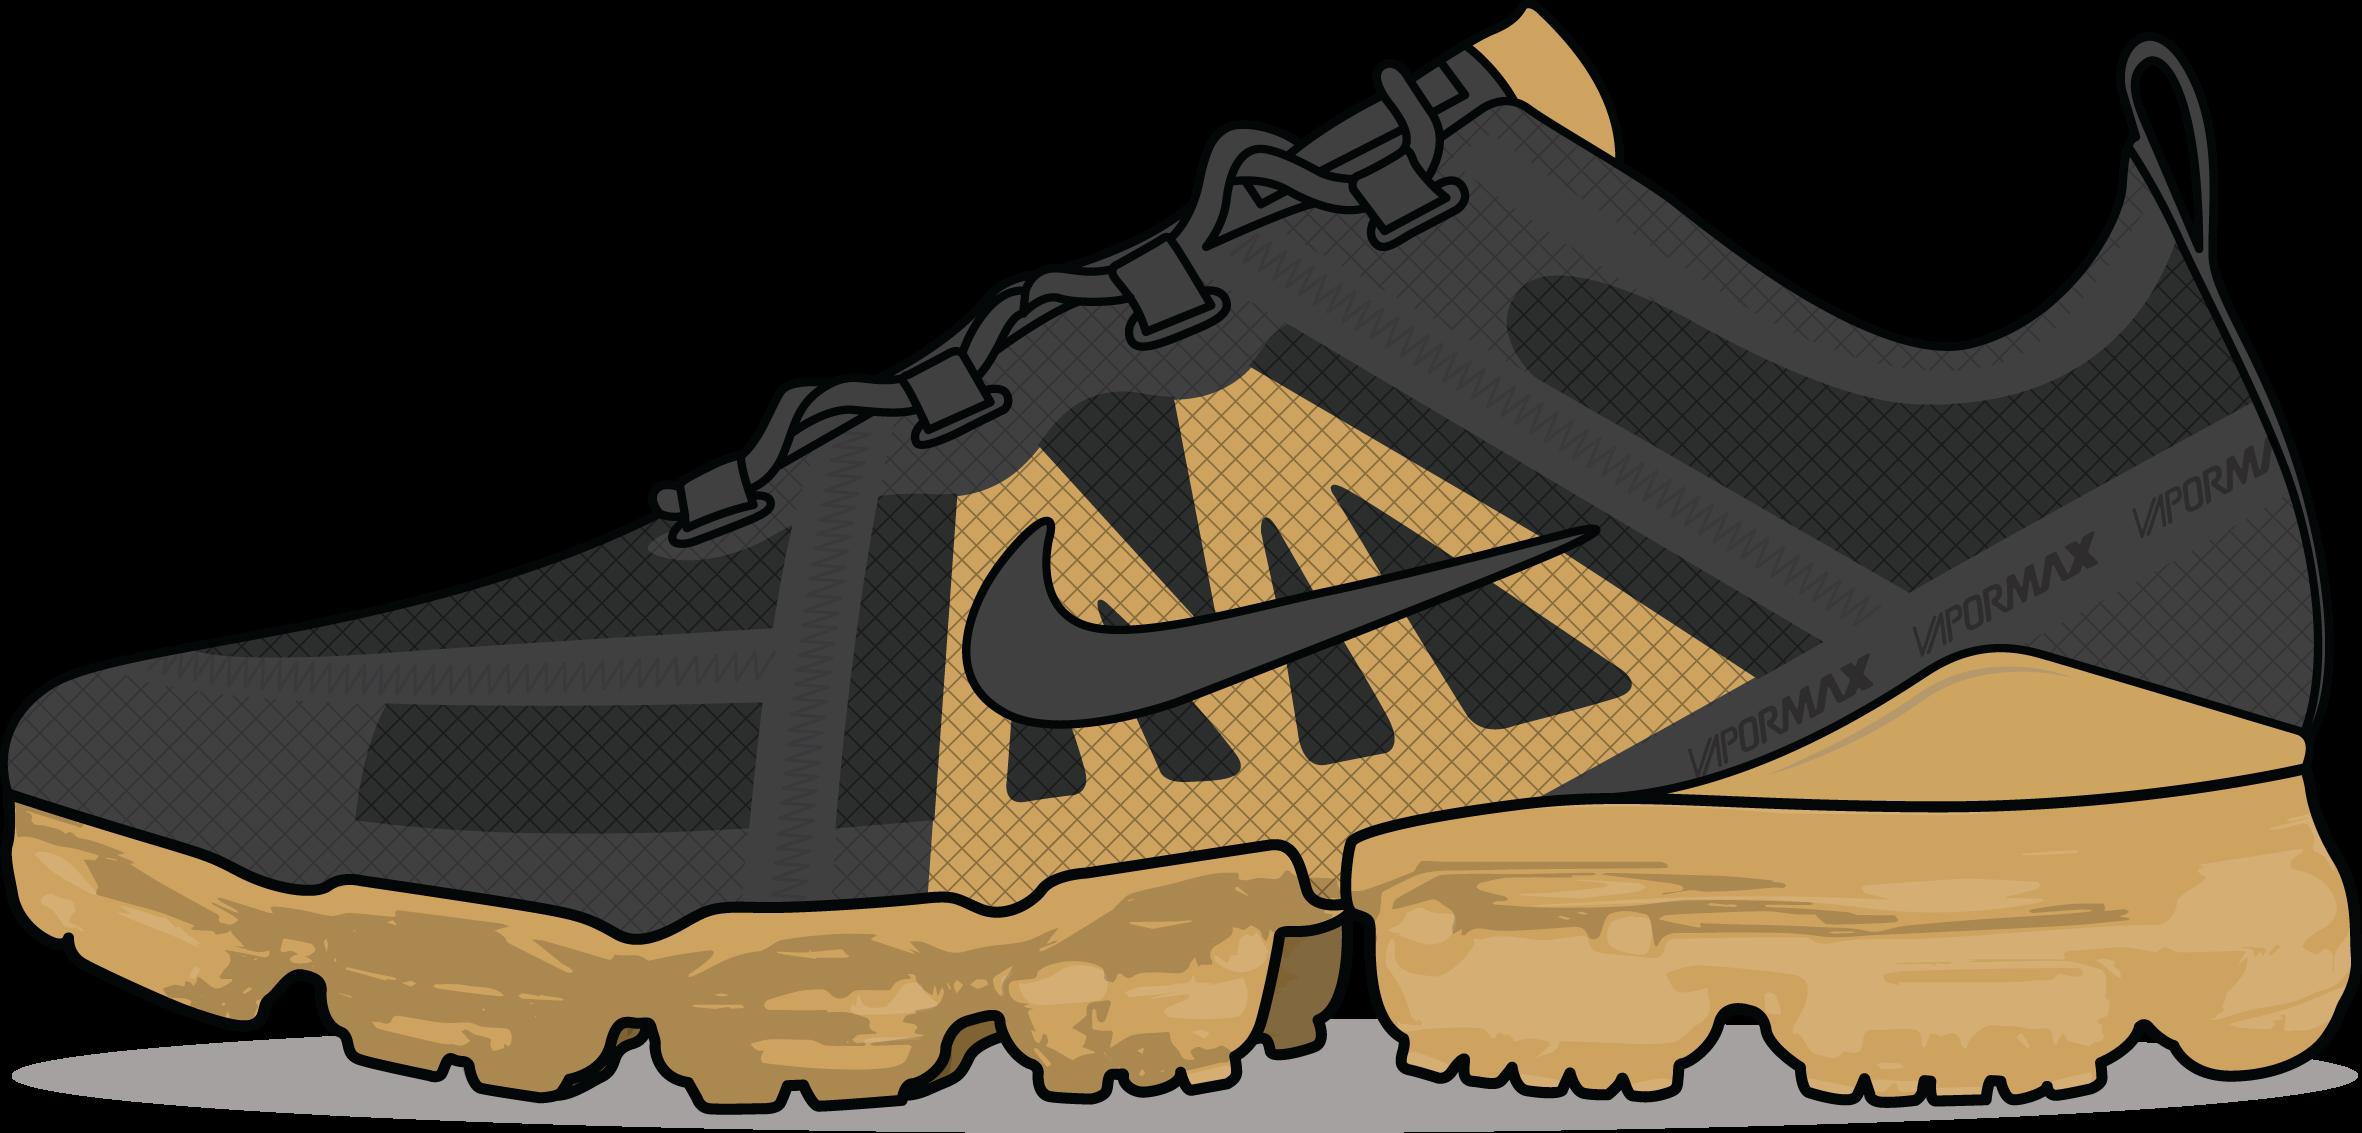 Nike Air VaporMax 2019 'Black/Gold'